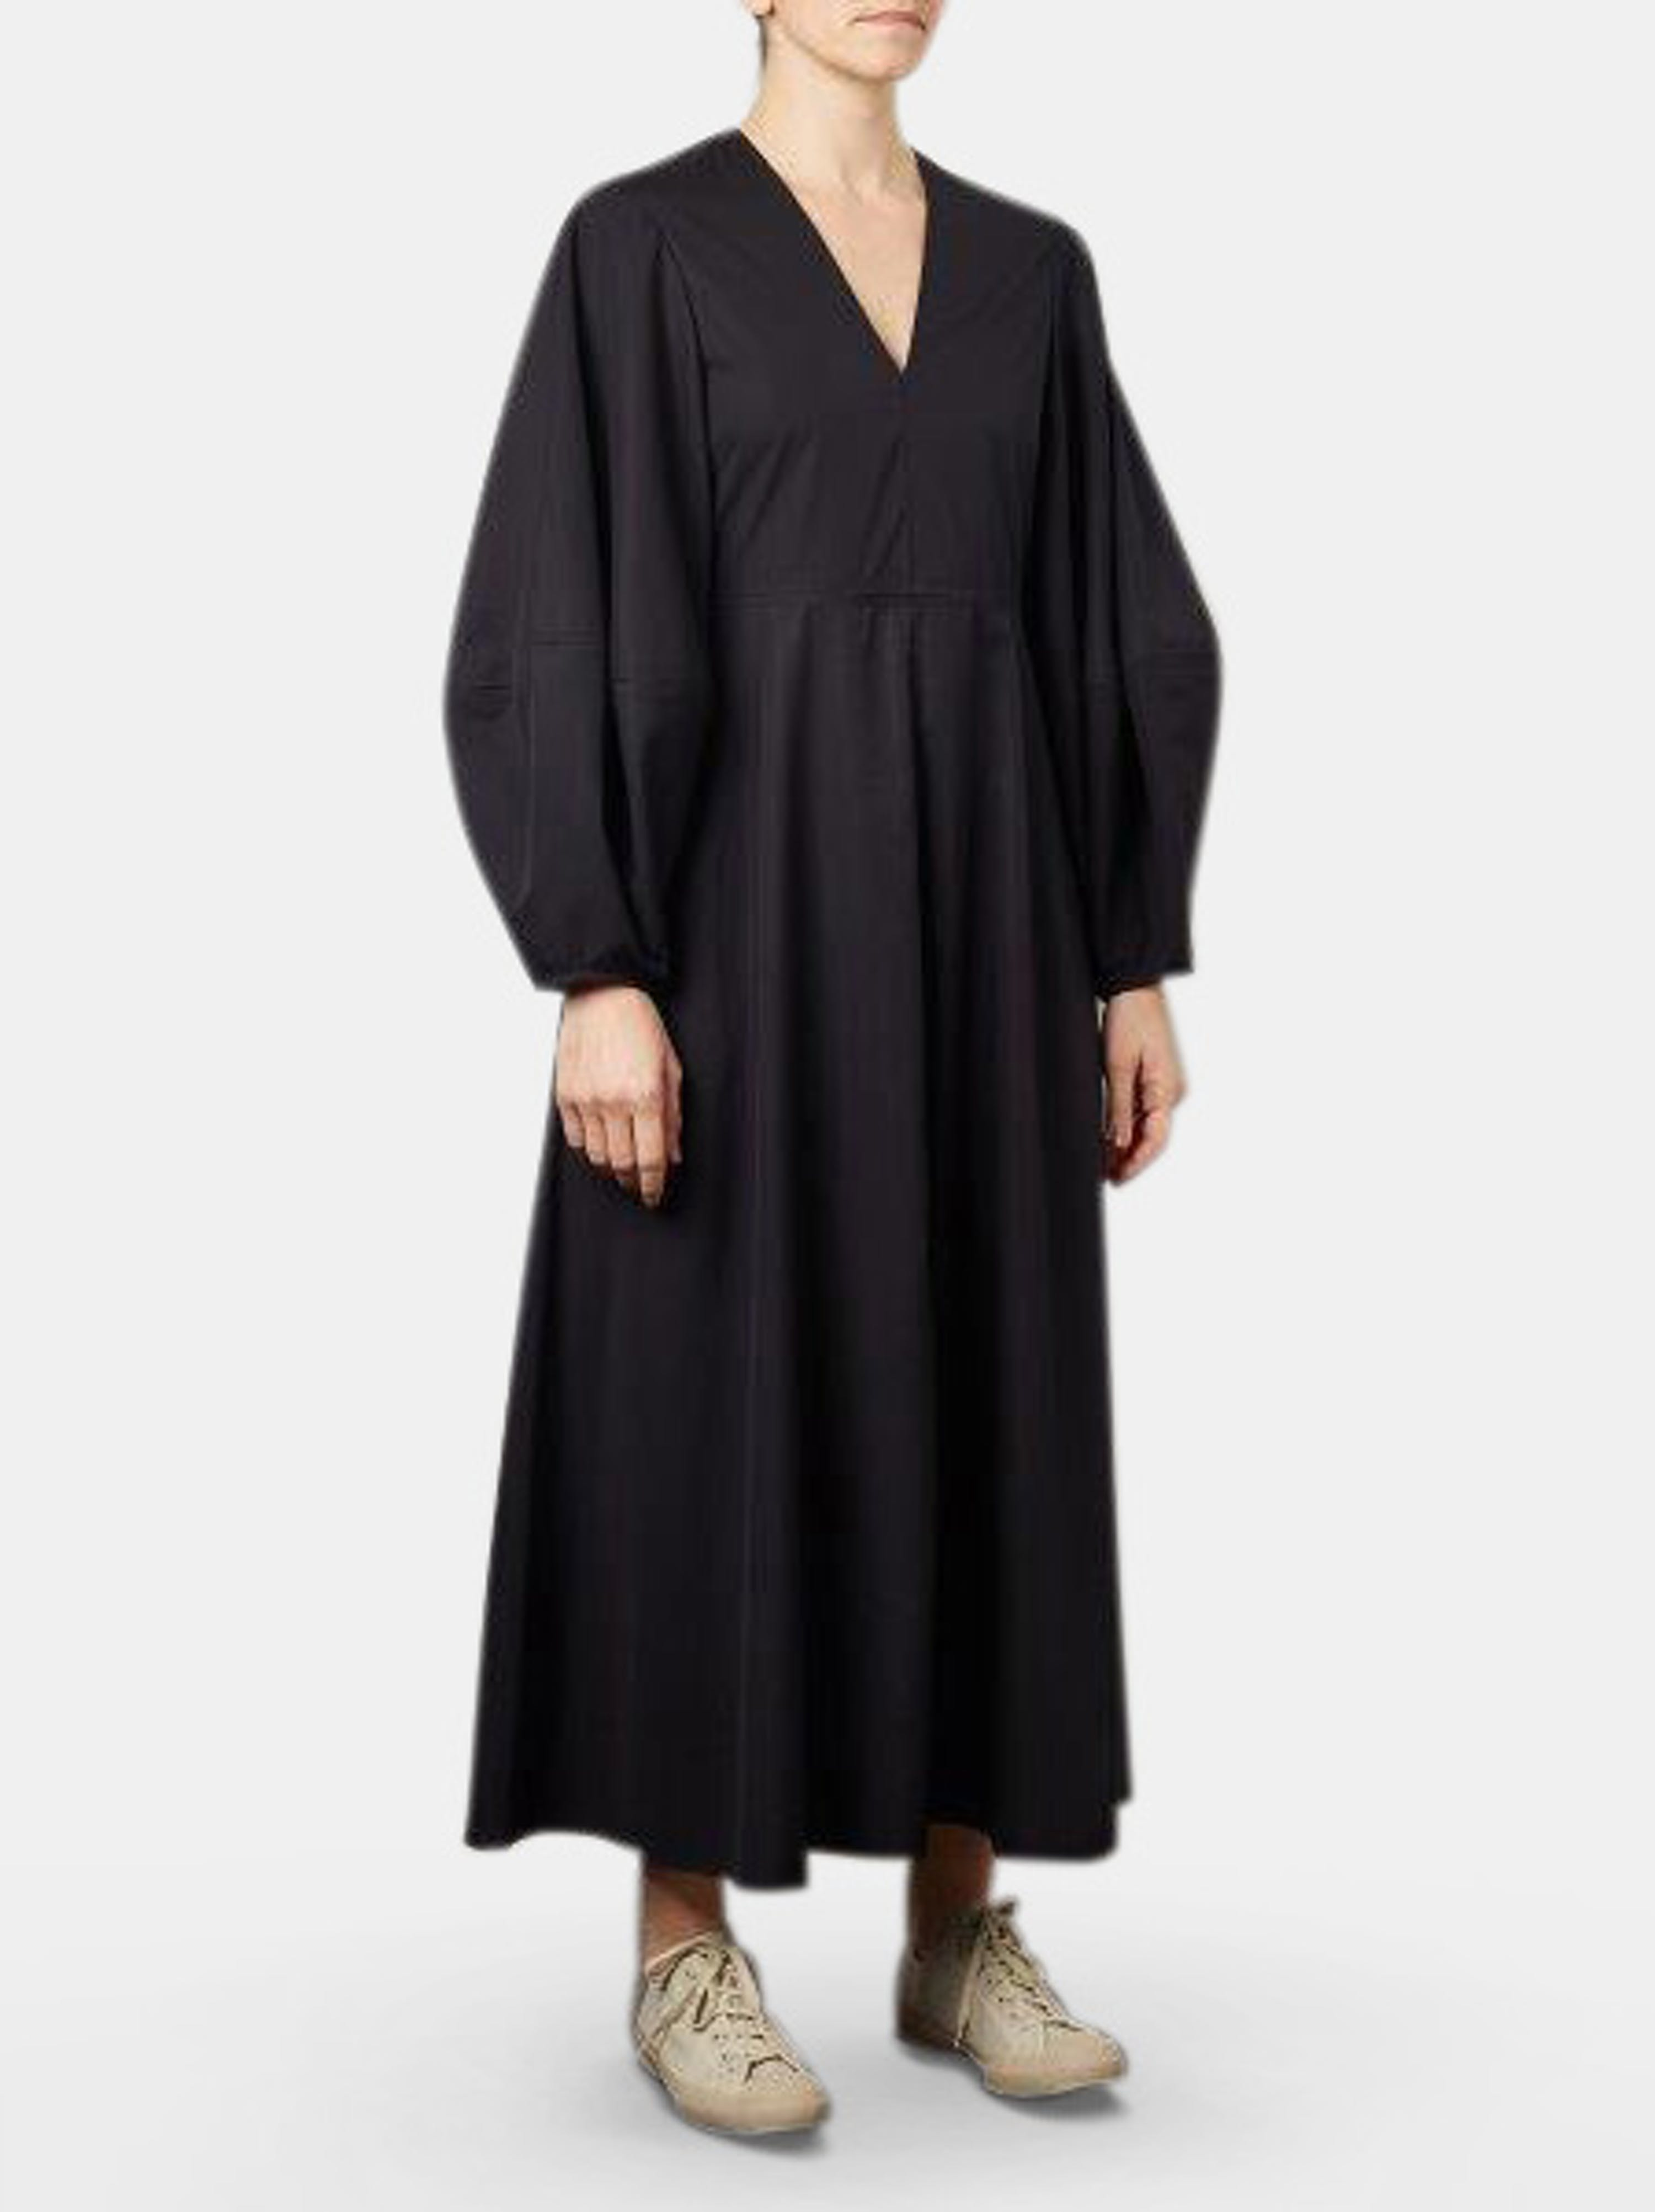 Studio Nicholson Convex Sleeve Dress In Black